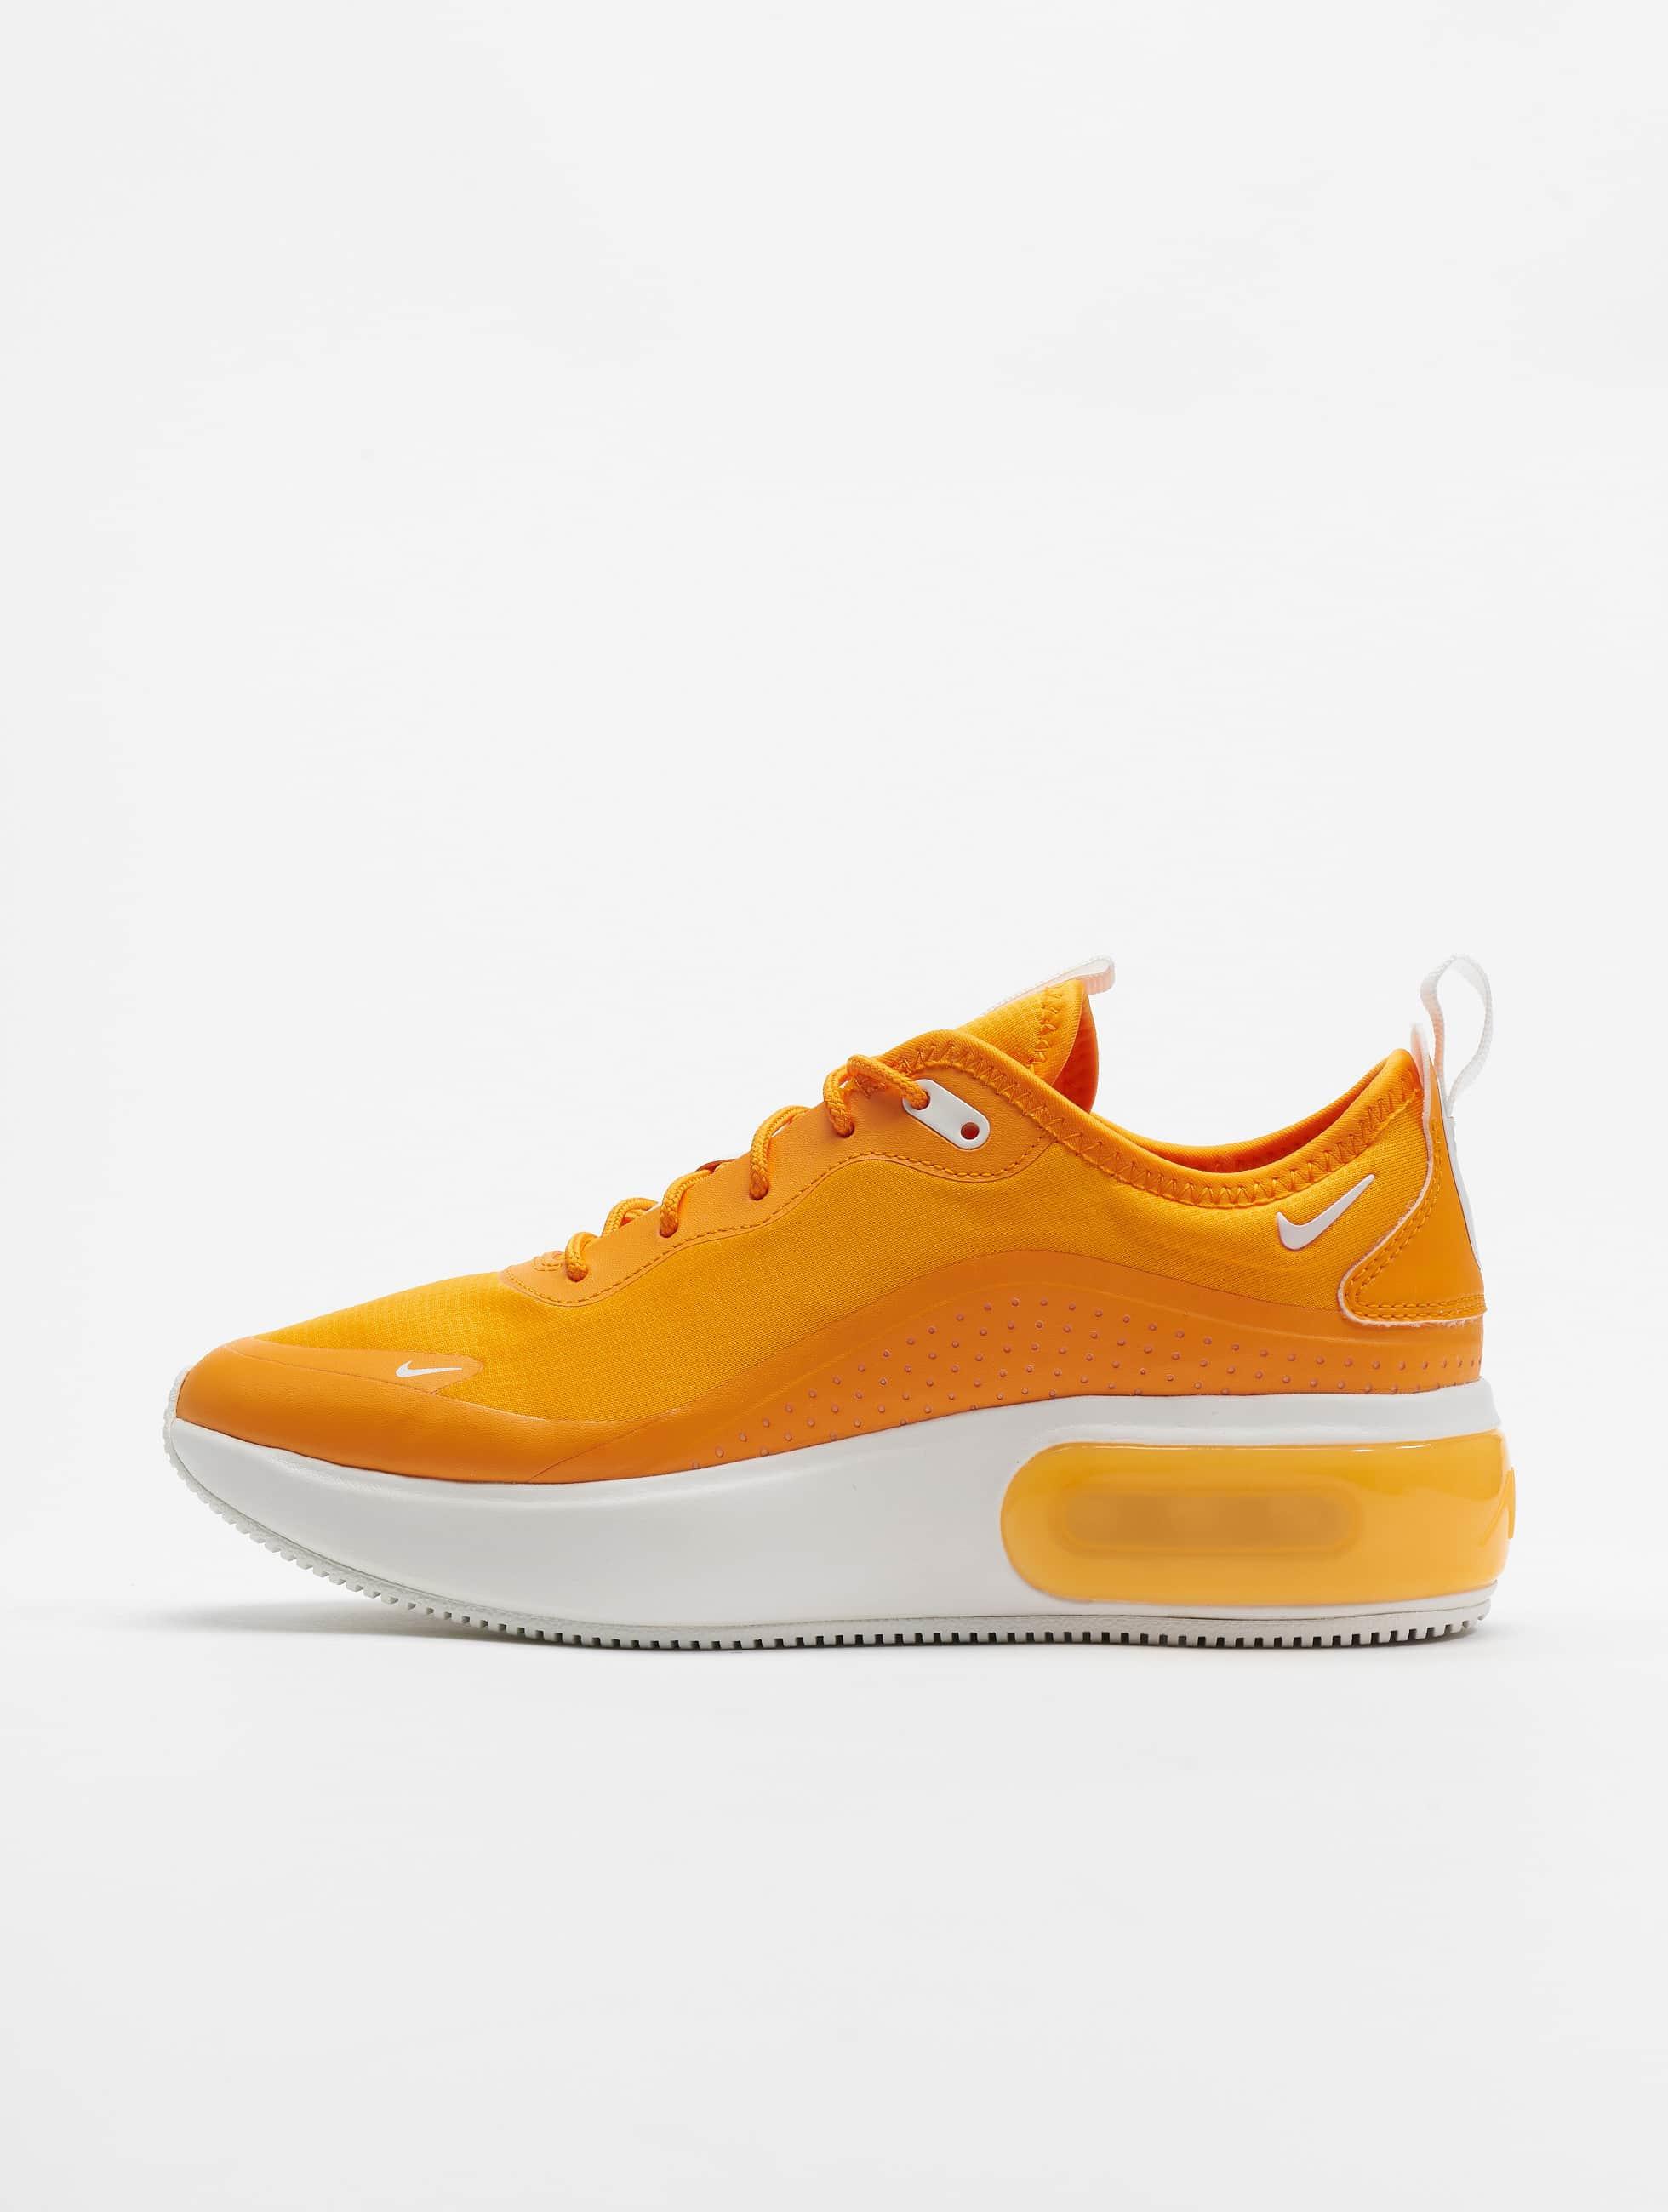 Nike Max Air White Sneakers Dia Orange Peelsummit Whitesummit D9WEHI2Y